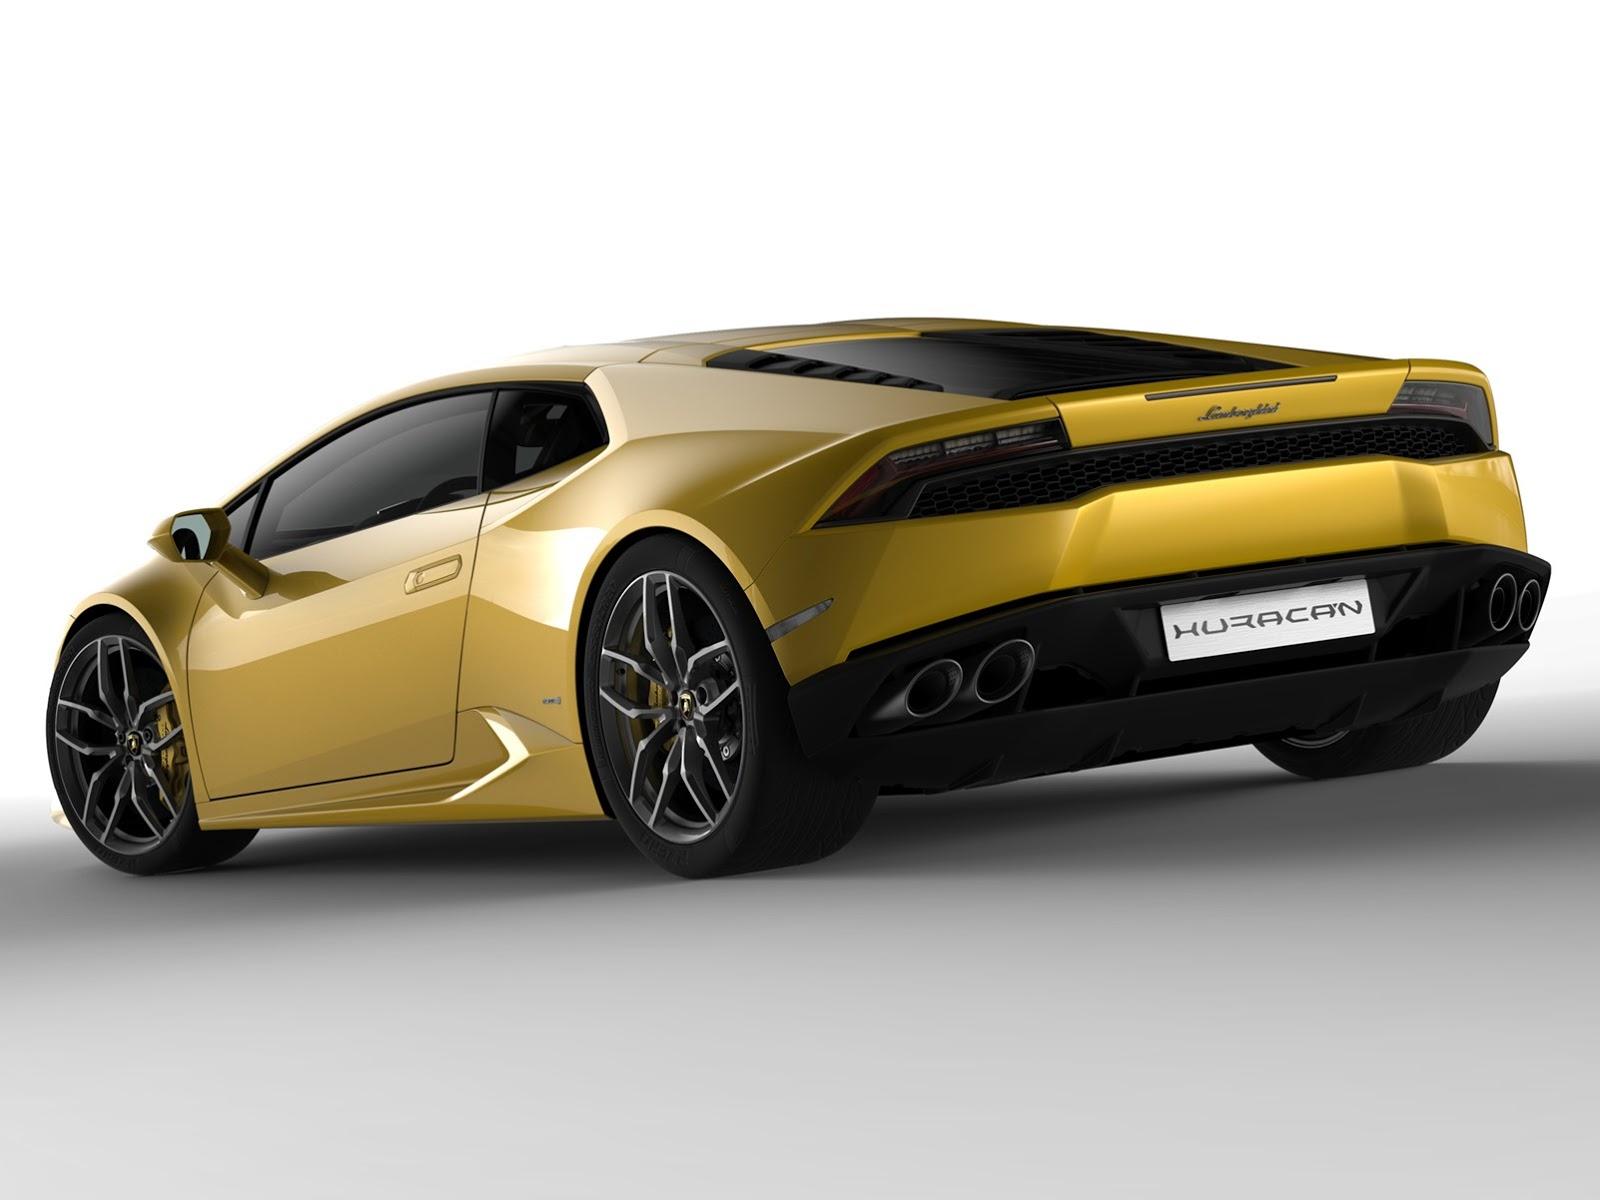 2013 - [Lamborghini] Huracán LP610-4  - Page 5 LAMBORGHINI-Huracan-8%25255B6%25255D